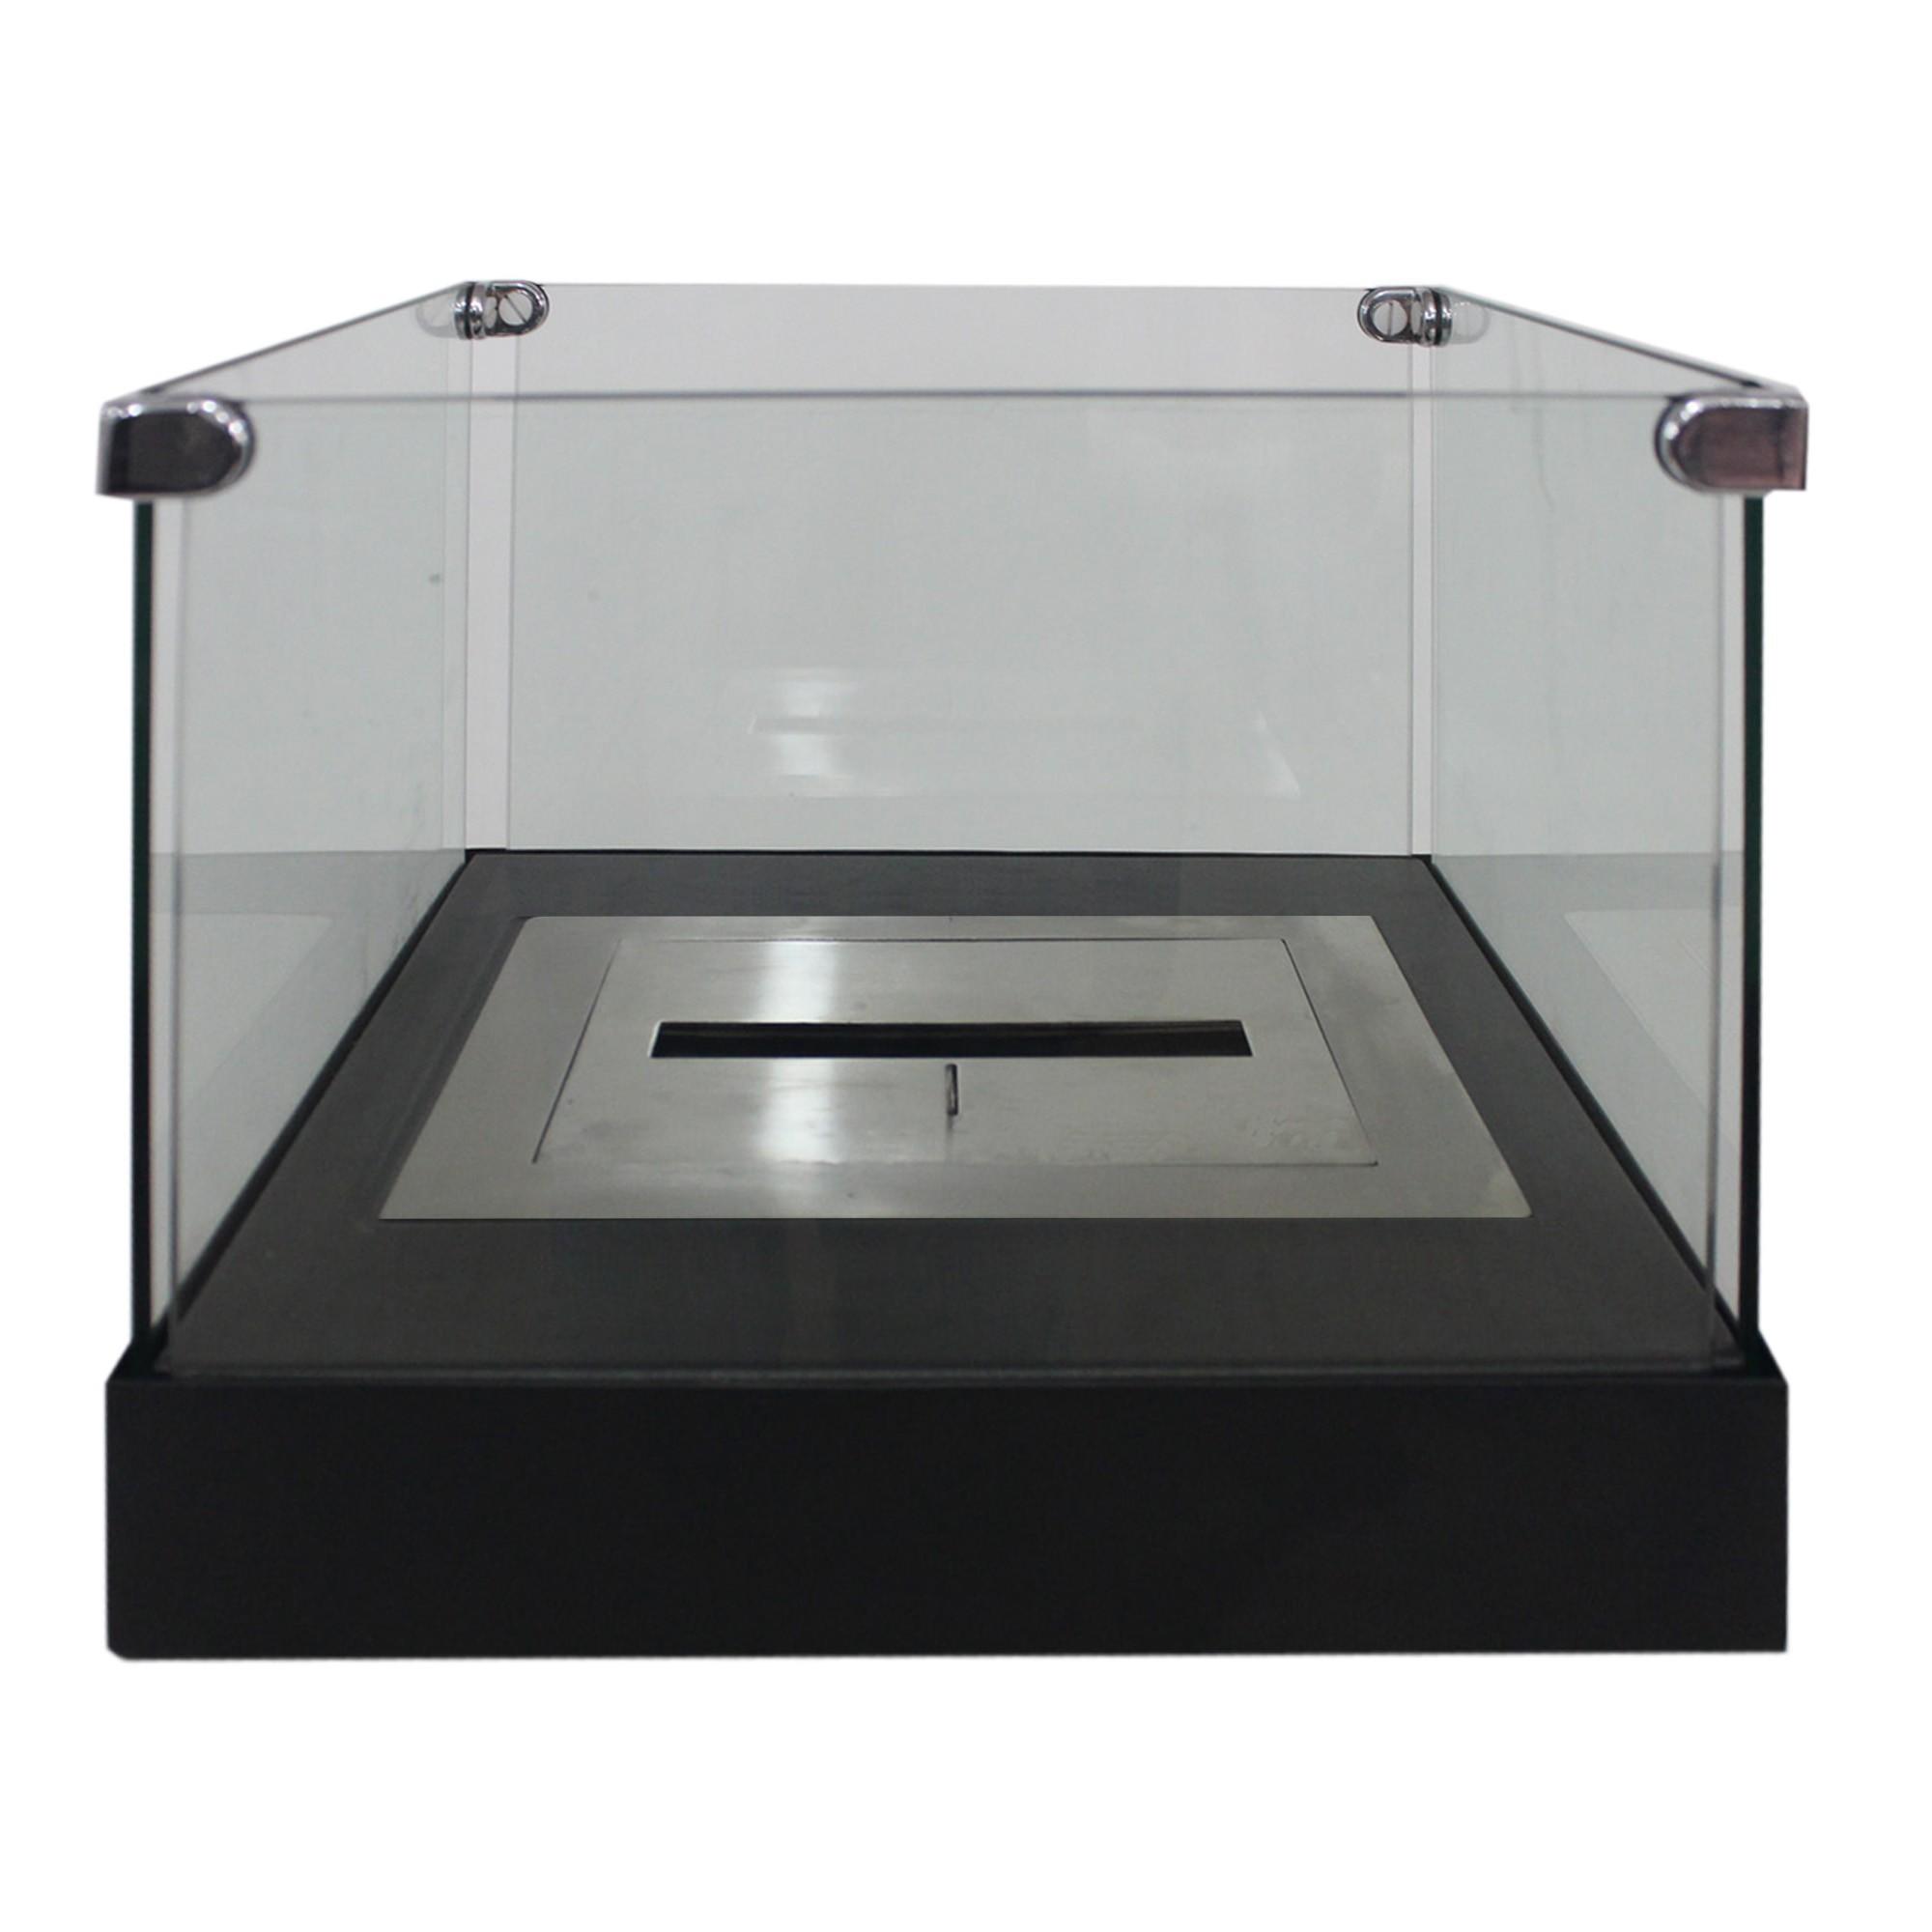 garten terrasse feuerstelle feuers ule feuerkorb bio. Black Bedroom Furniture Sets. Home Design Ideas